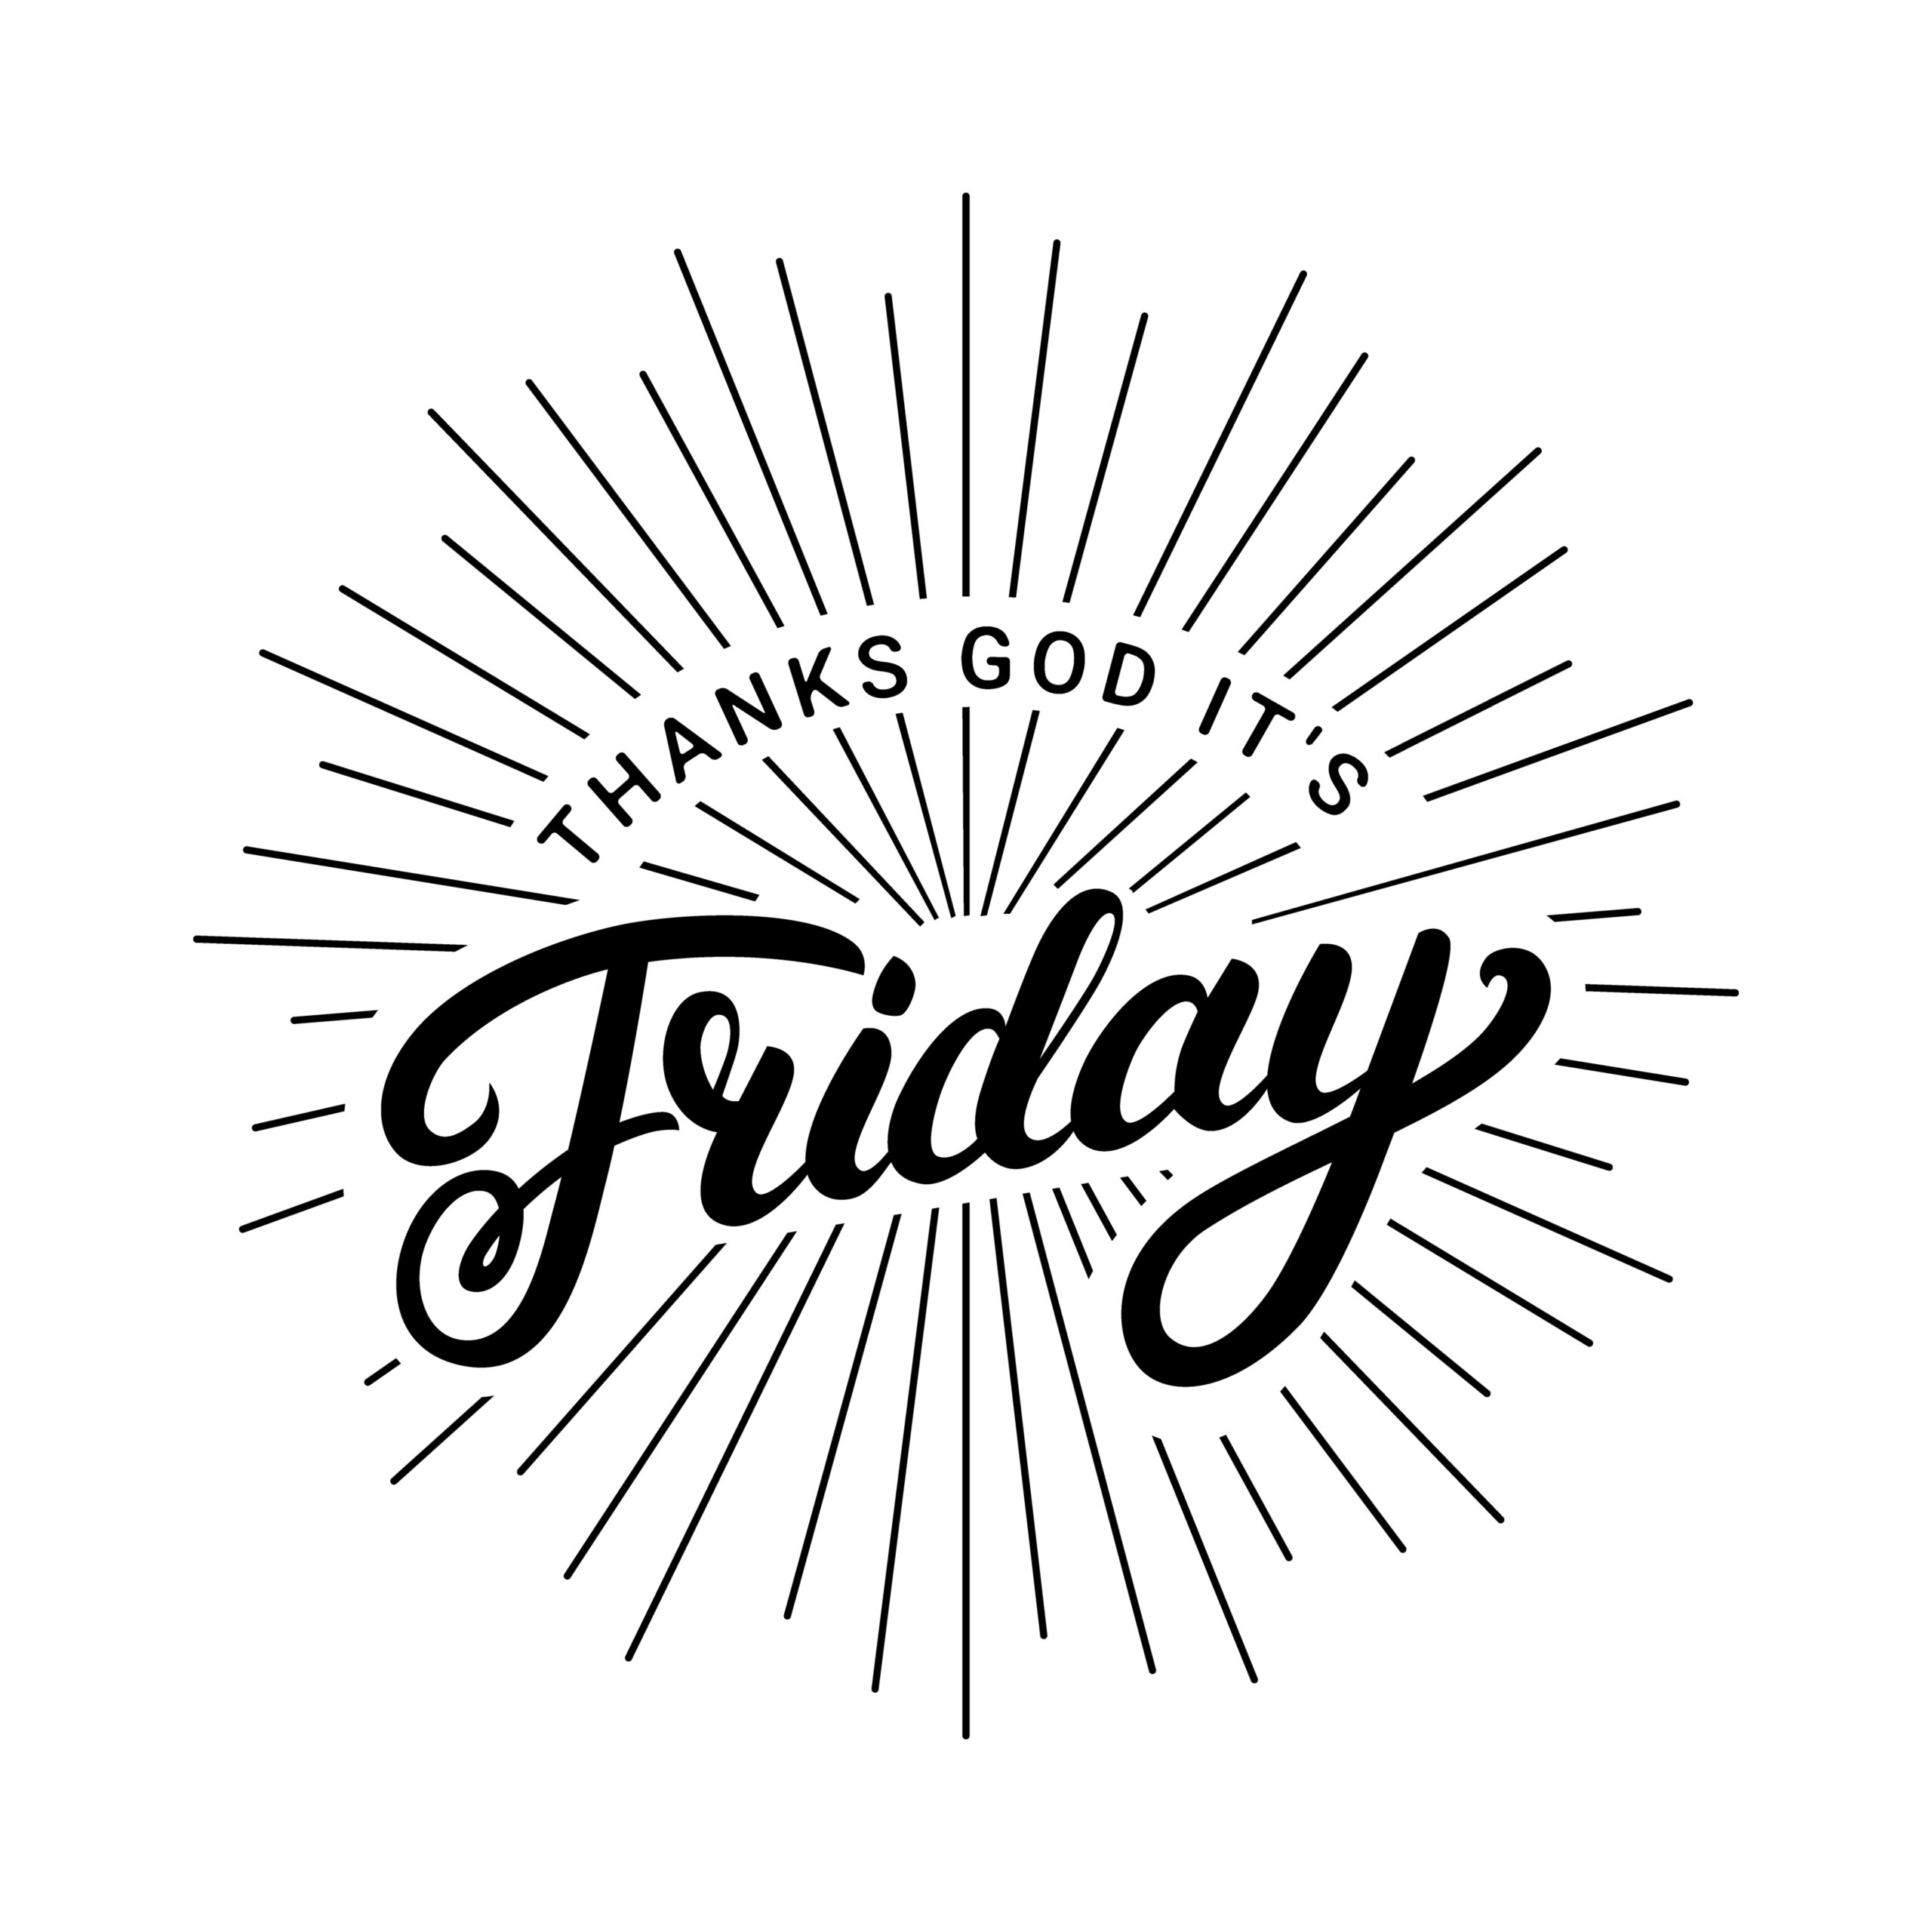 TGIF|華金(Thanks god it's Friday)